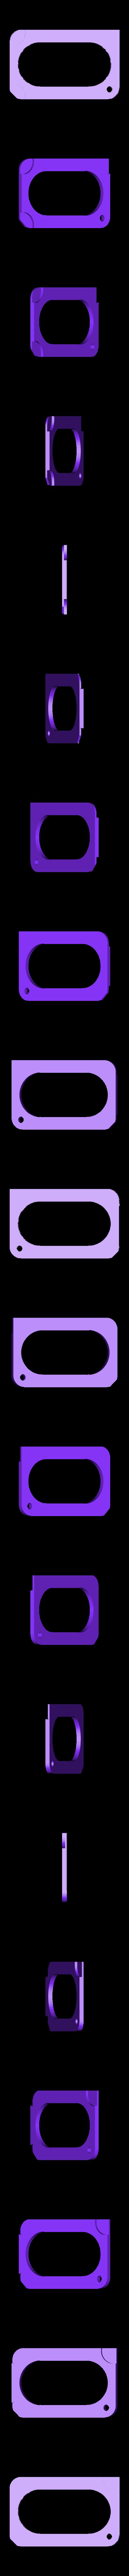 KEYSTORAGE3mm.stl Download free STL file Credit Card Key Case • Template to 3D print, Gophy